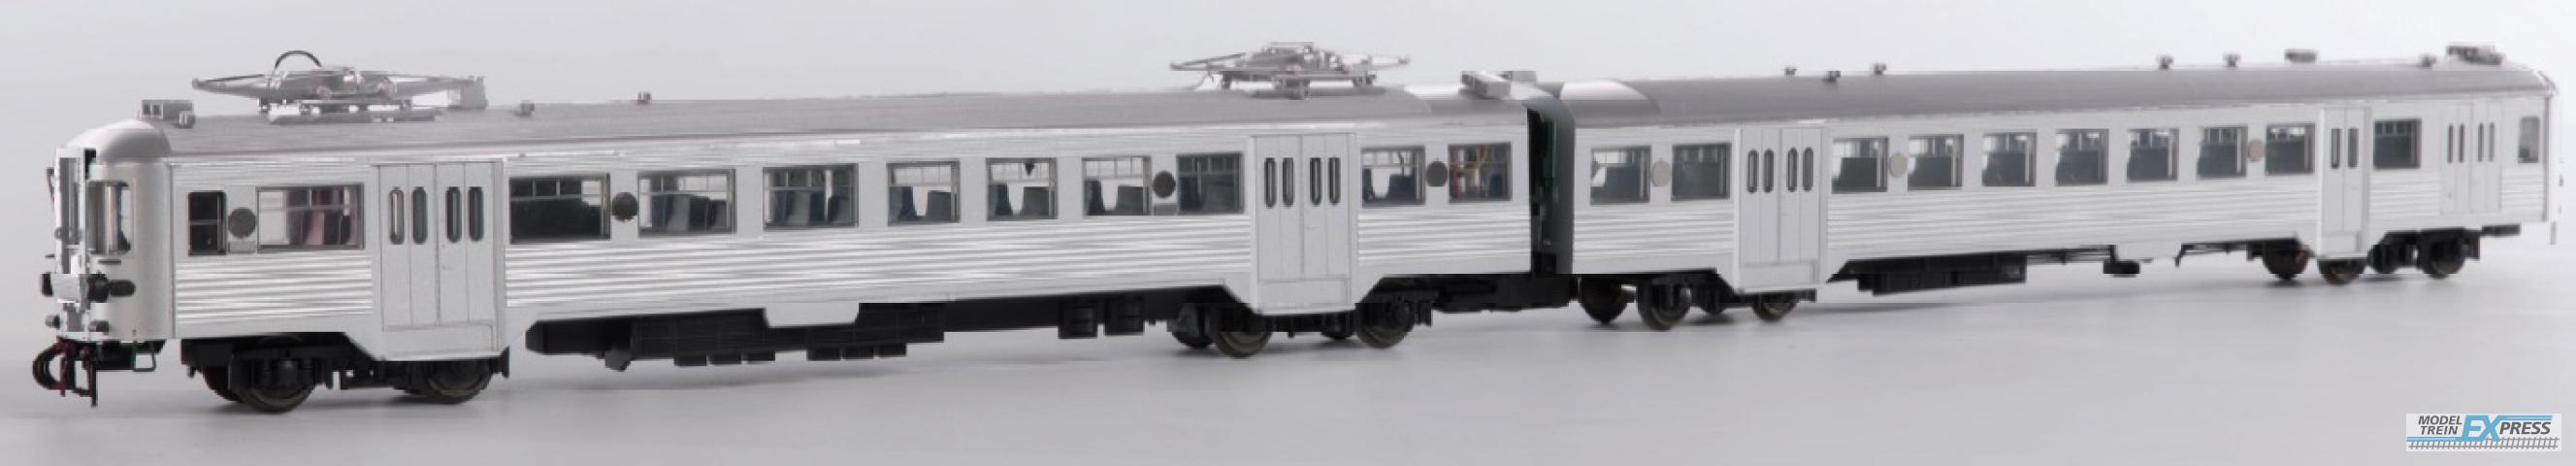 B-Models 7101.02L